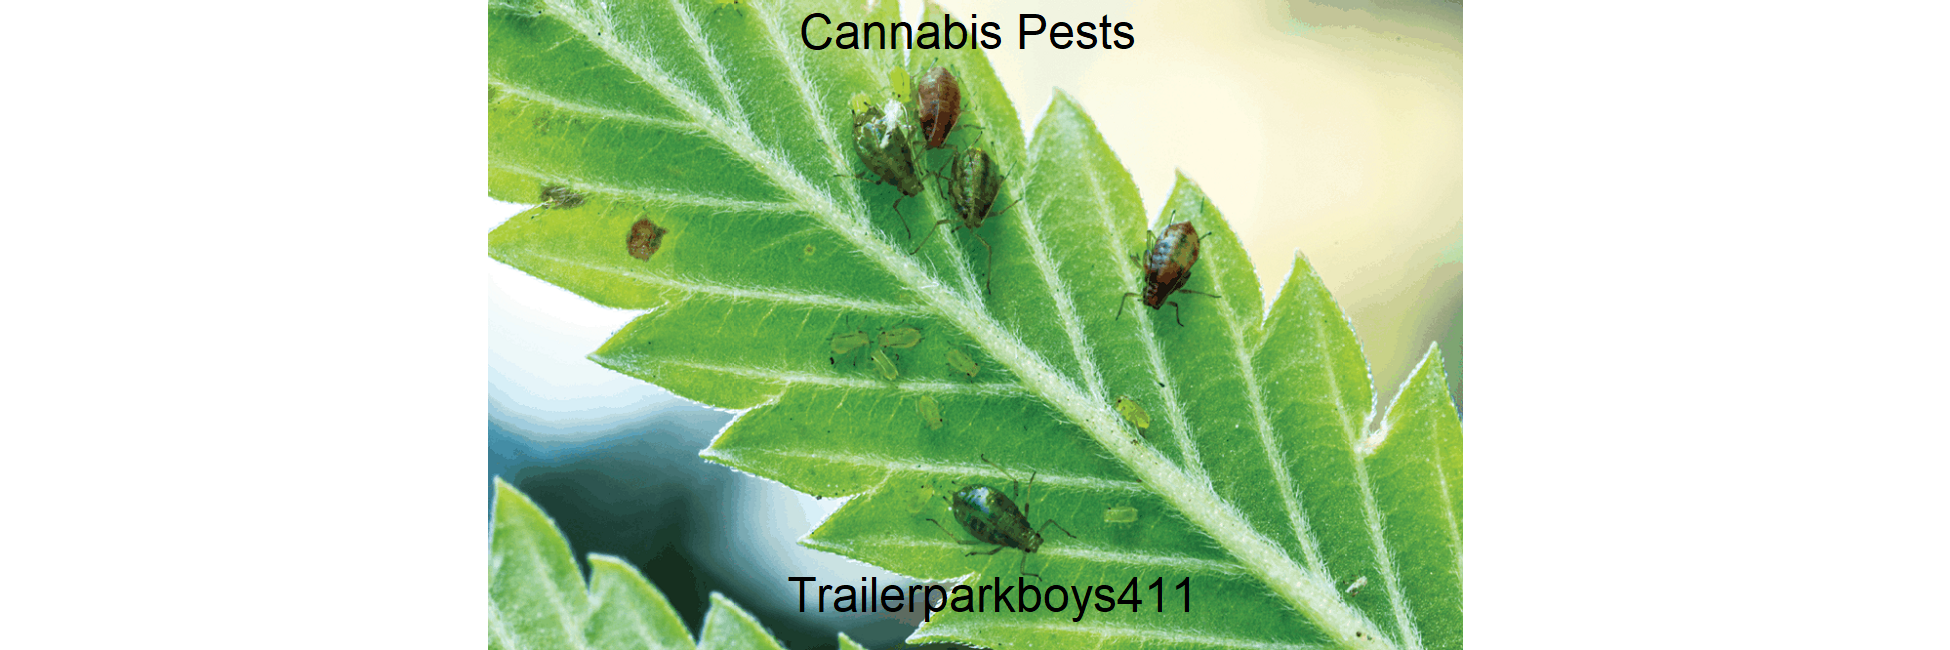 Cannabis Pests